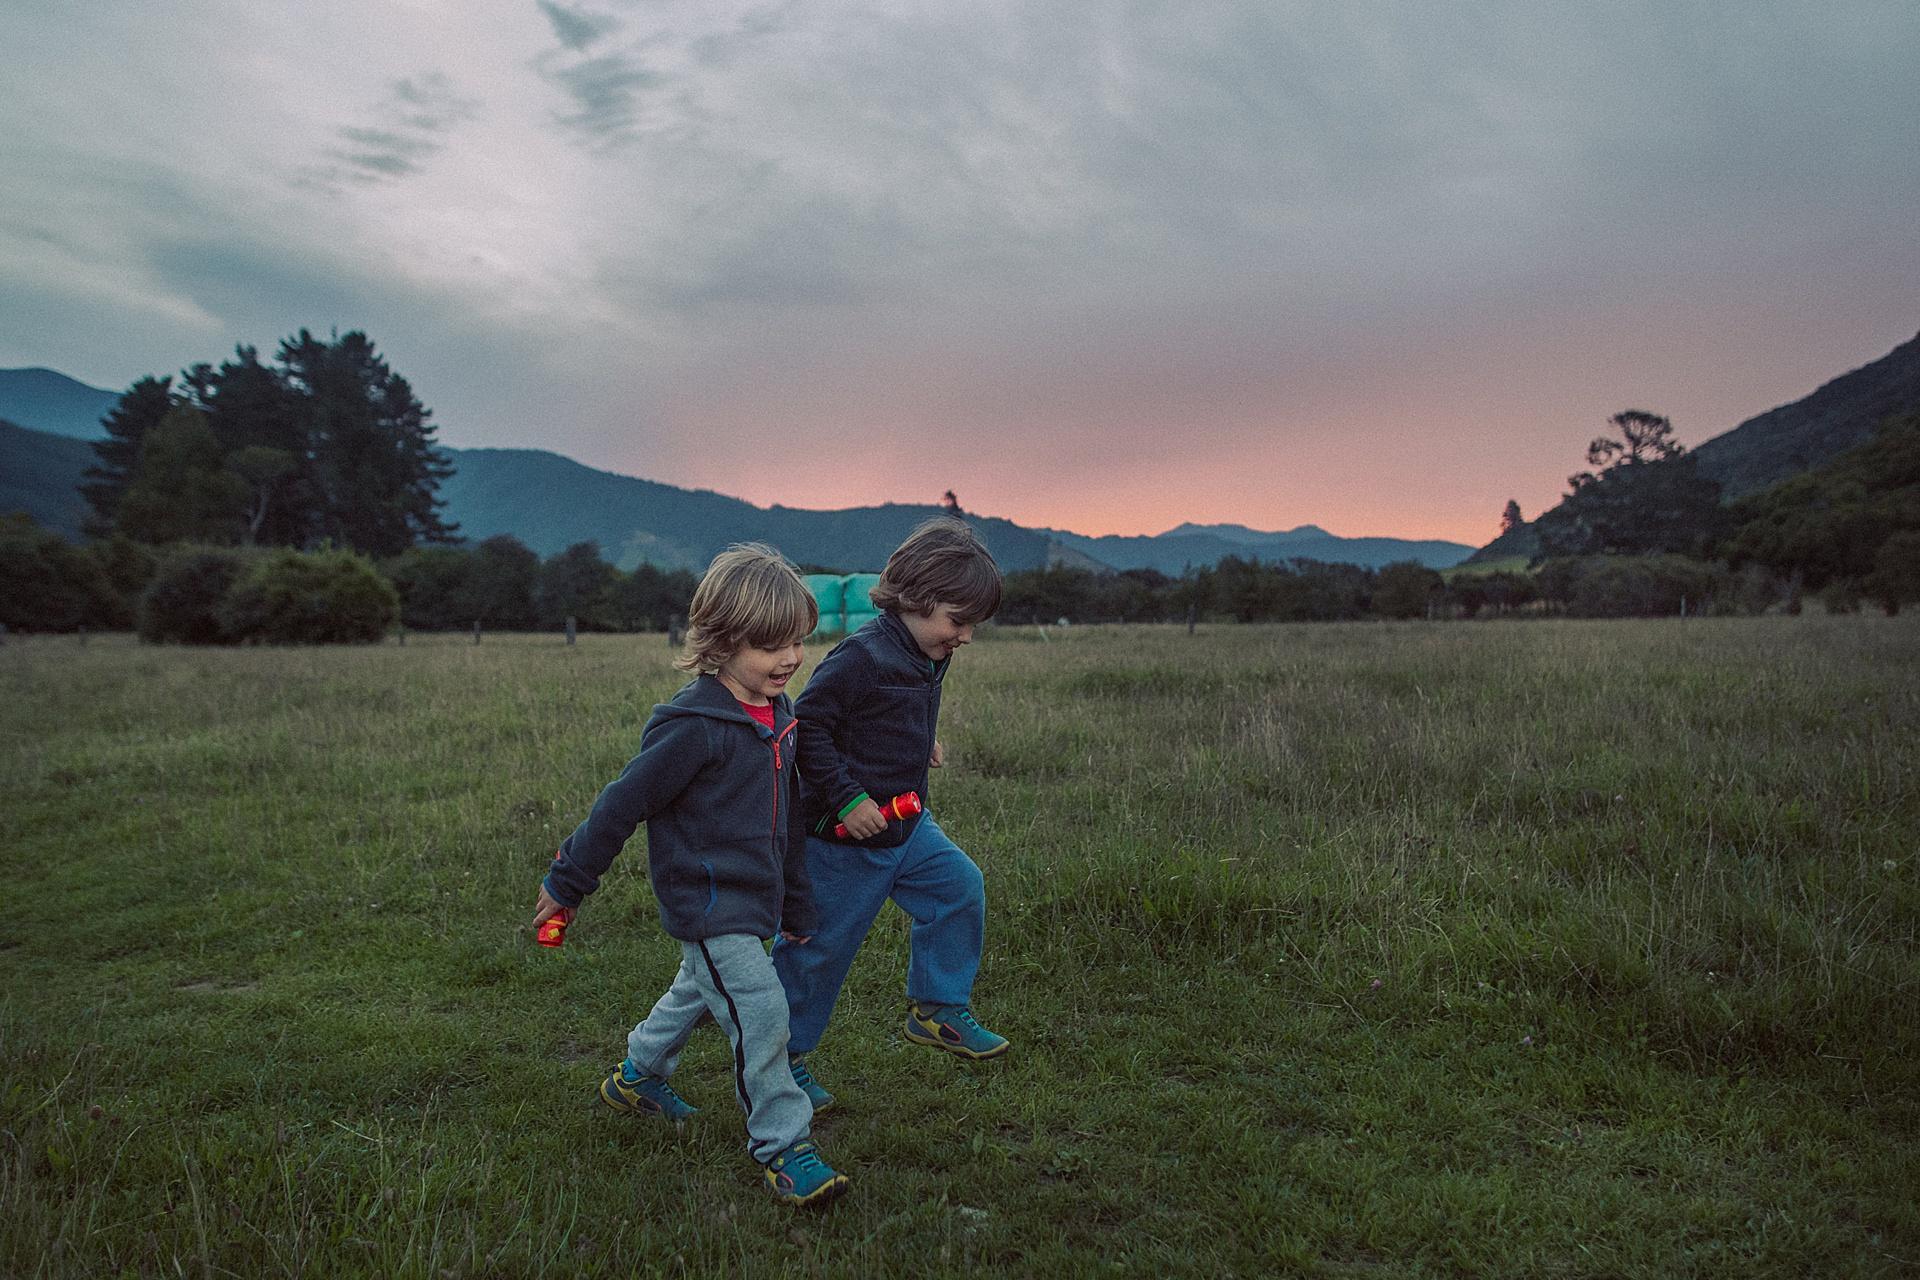 family-roadtrip-neuseeland-travelnewzealand-danielzube_0604.jpg